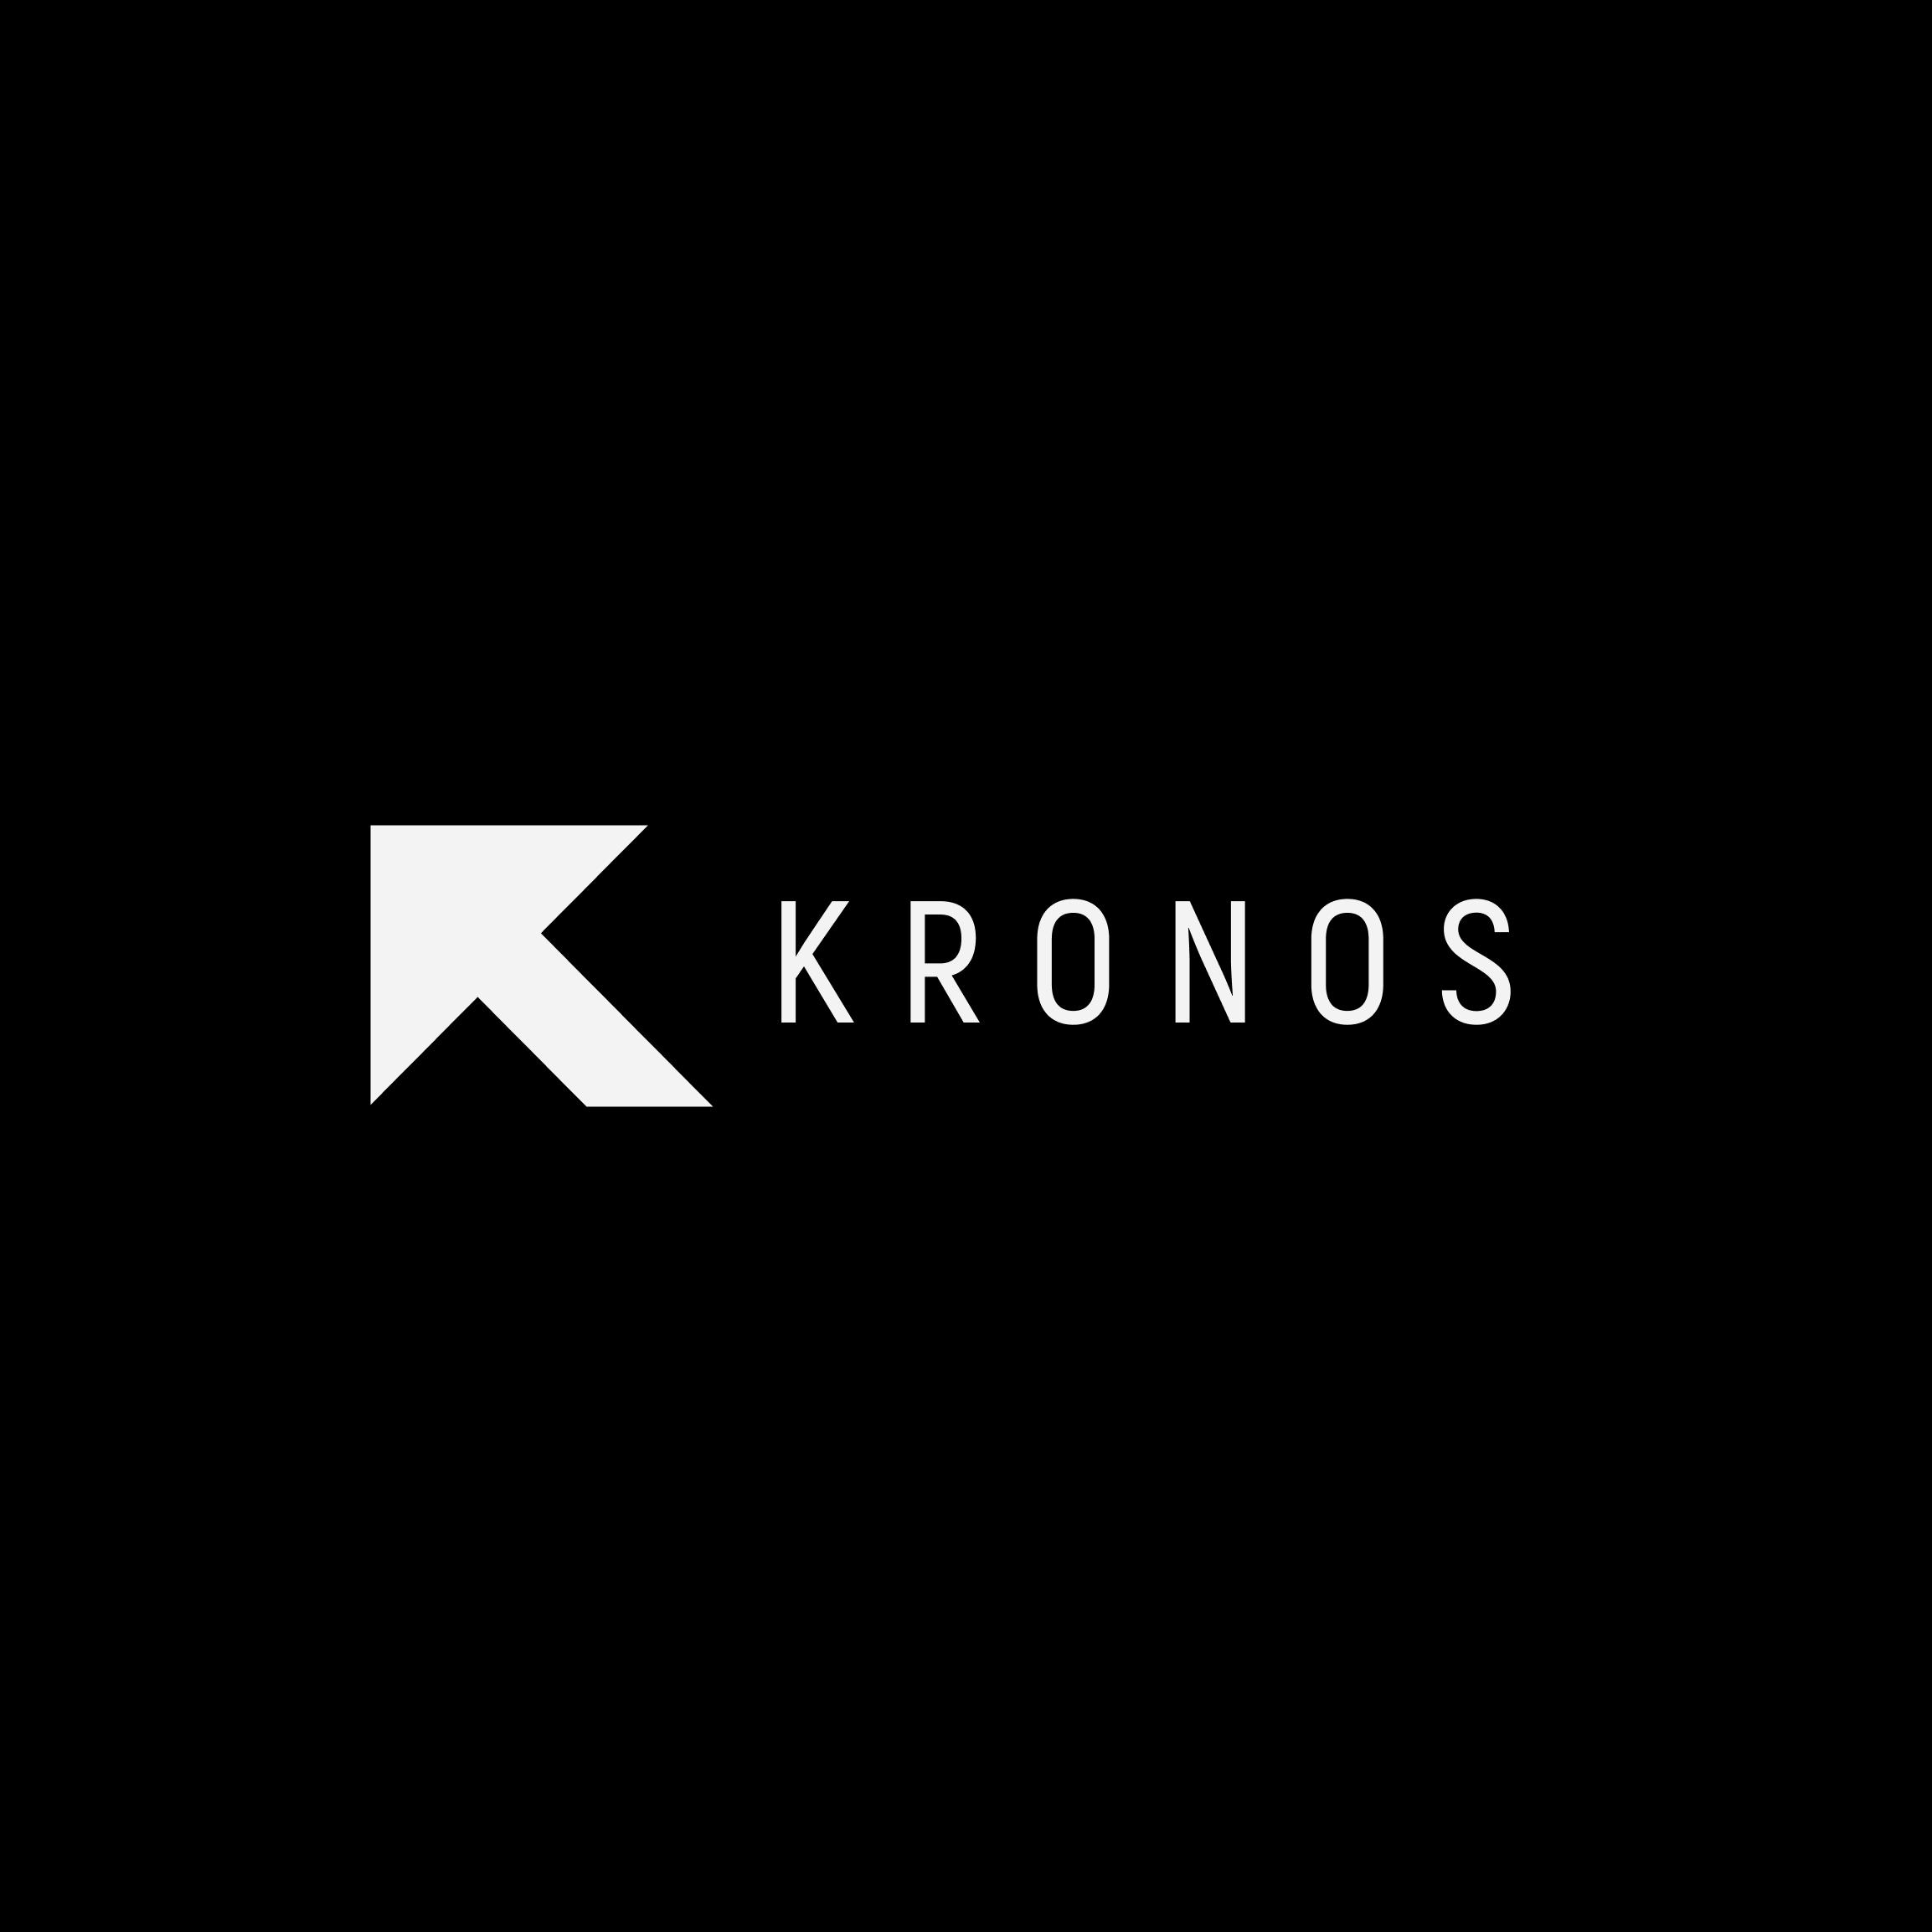 Разработать логотип KRONOS фото f_5175faf15047b711.png